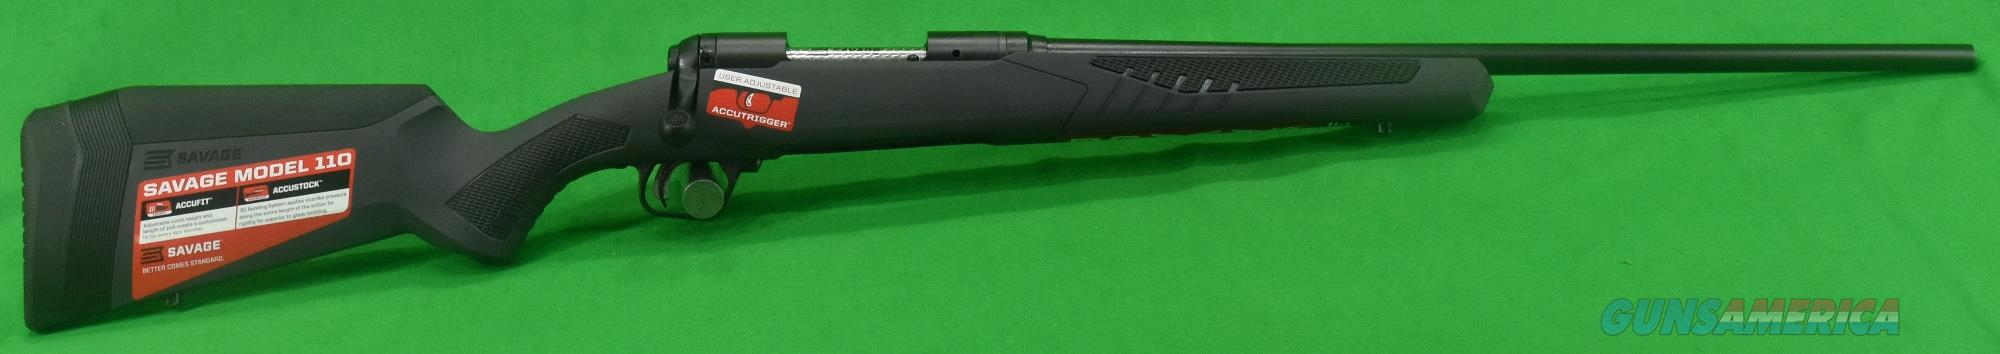 110 Hunter Gray Syn 243Win 22In  57063  Guns > Rifles > Savage Rifles > 10/110